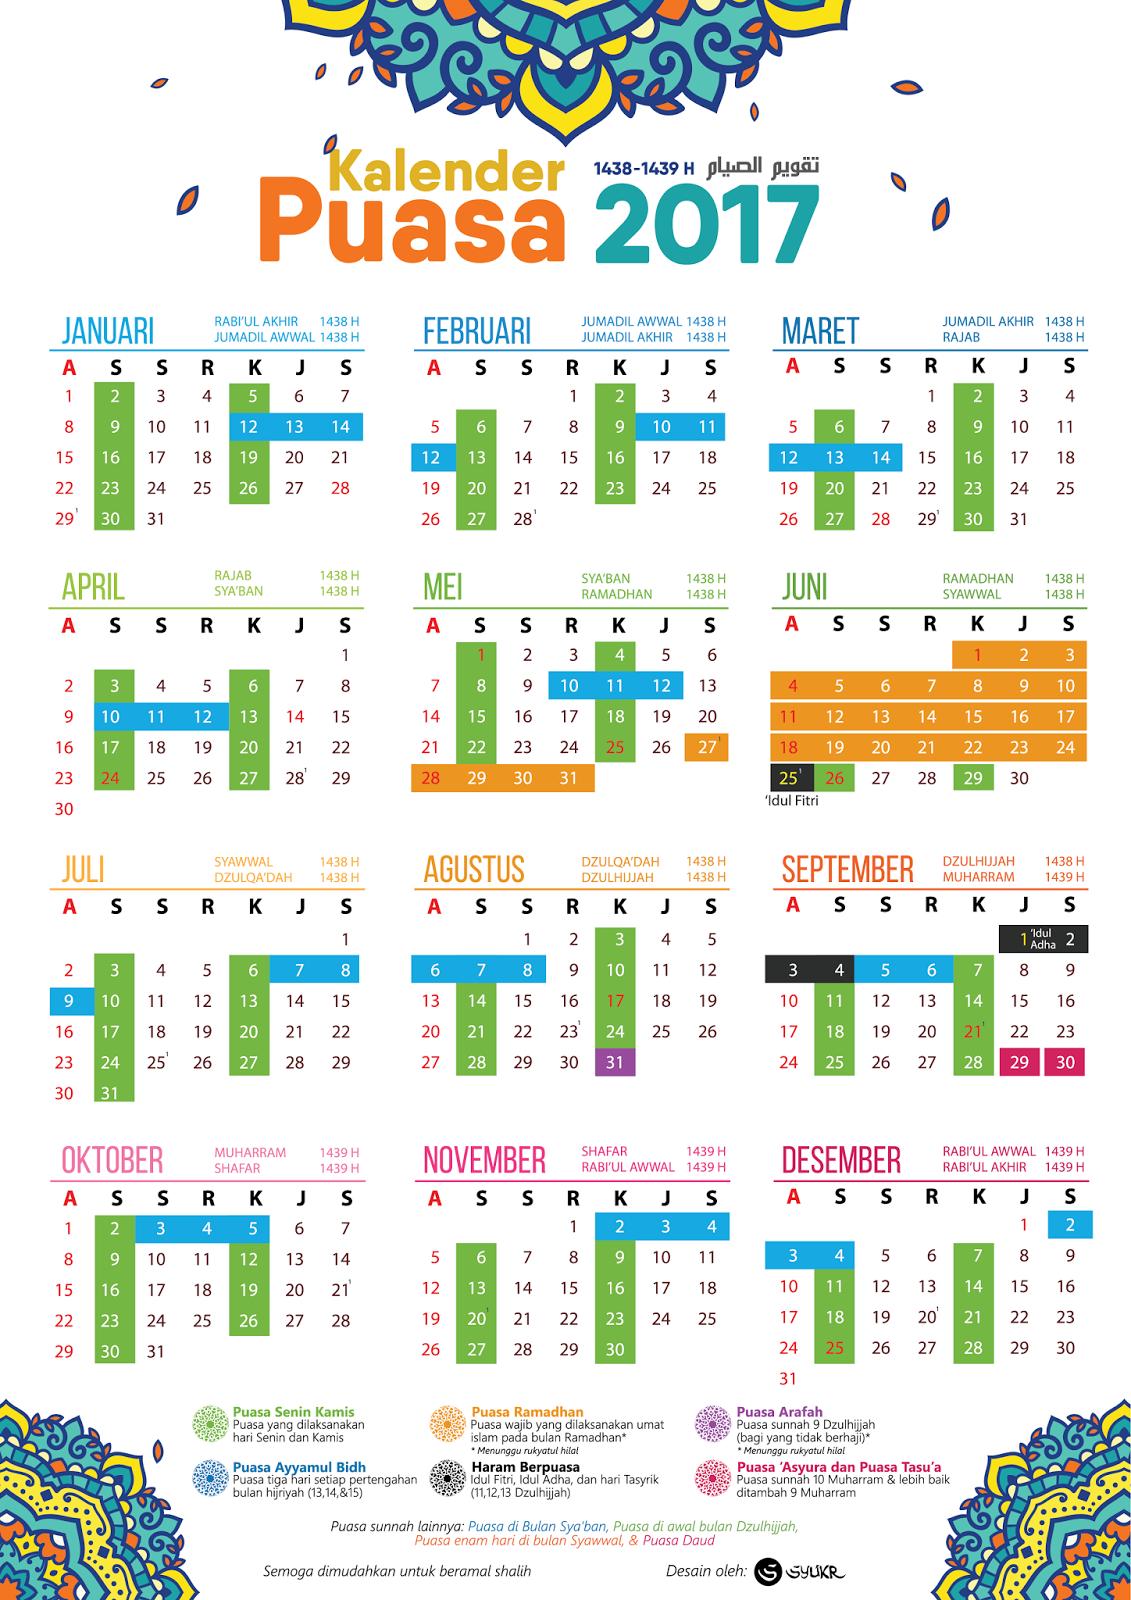 Kalendar Puasa Sunat Dan Wajib 2018  Permohonanmy